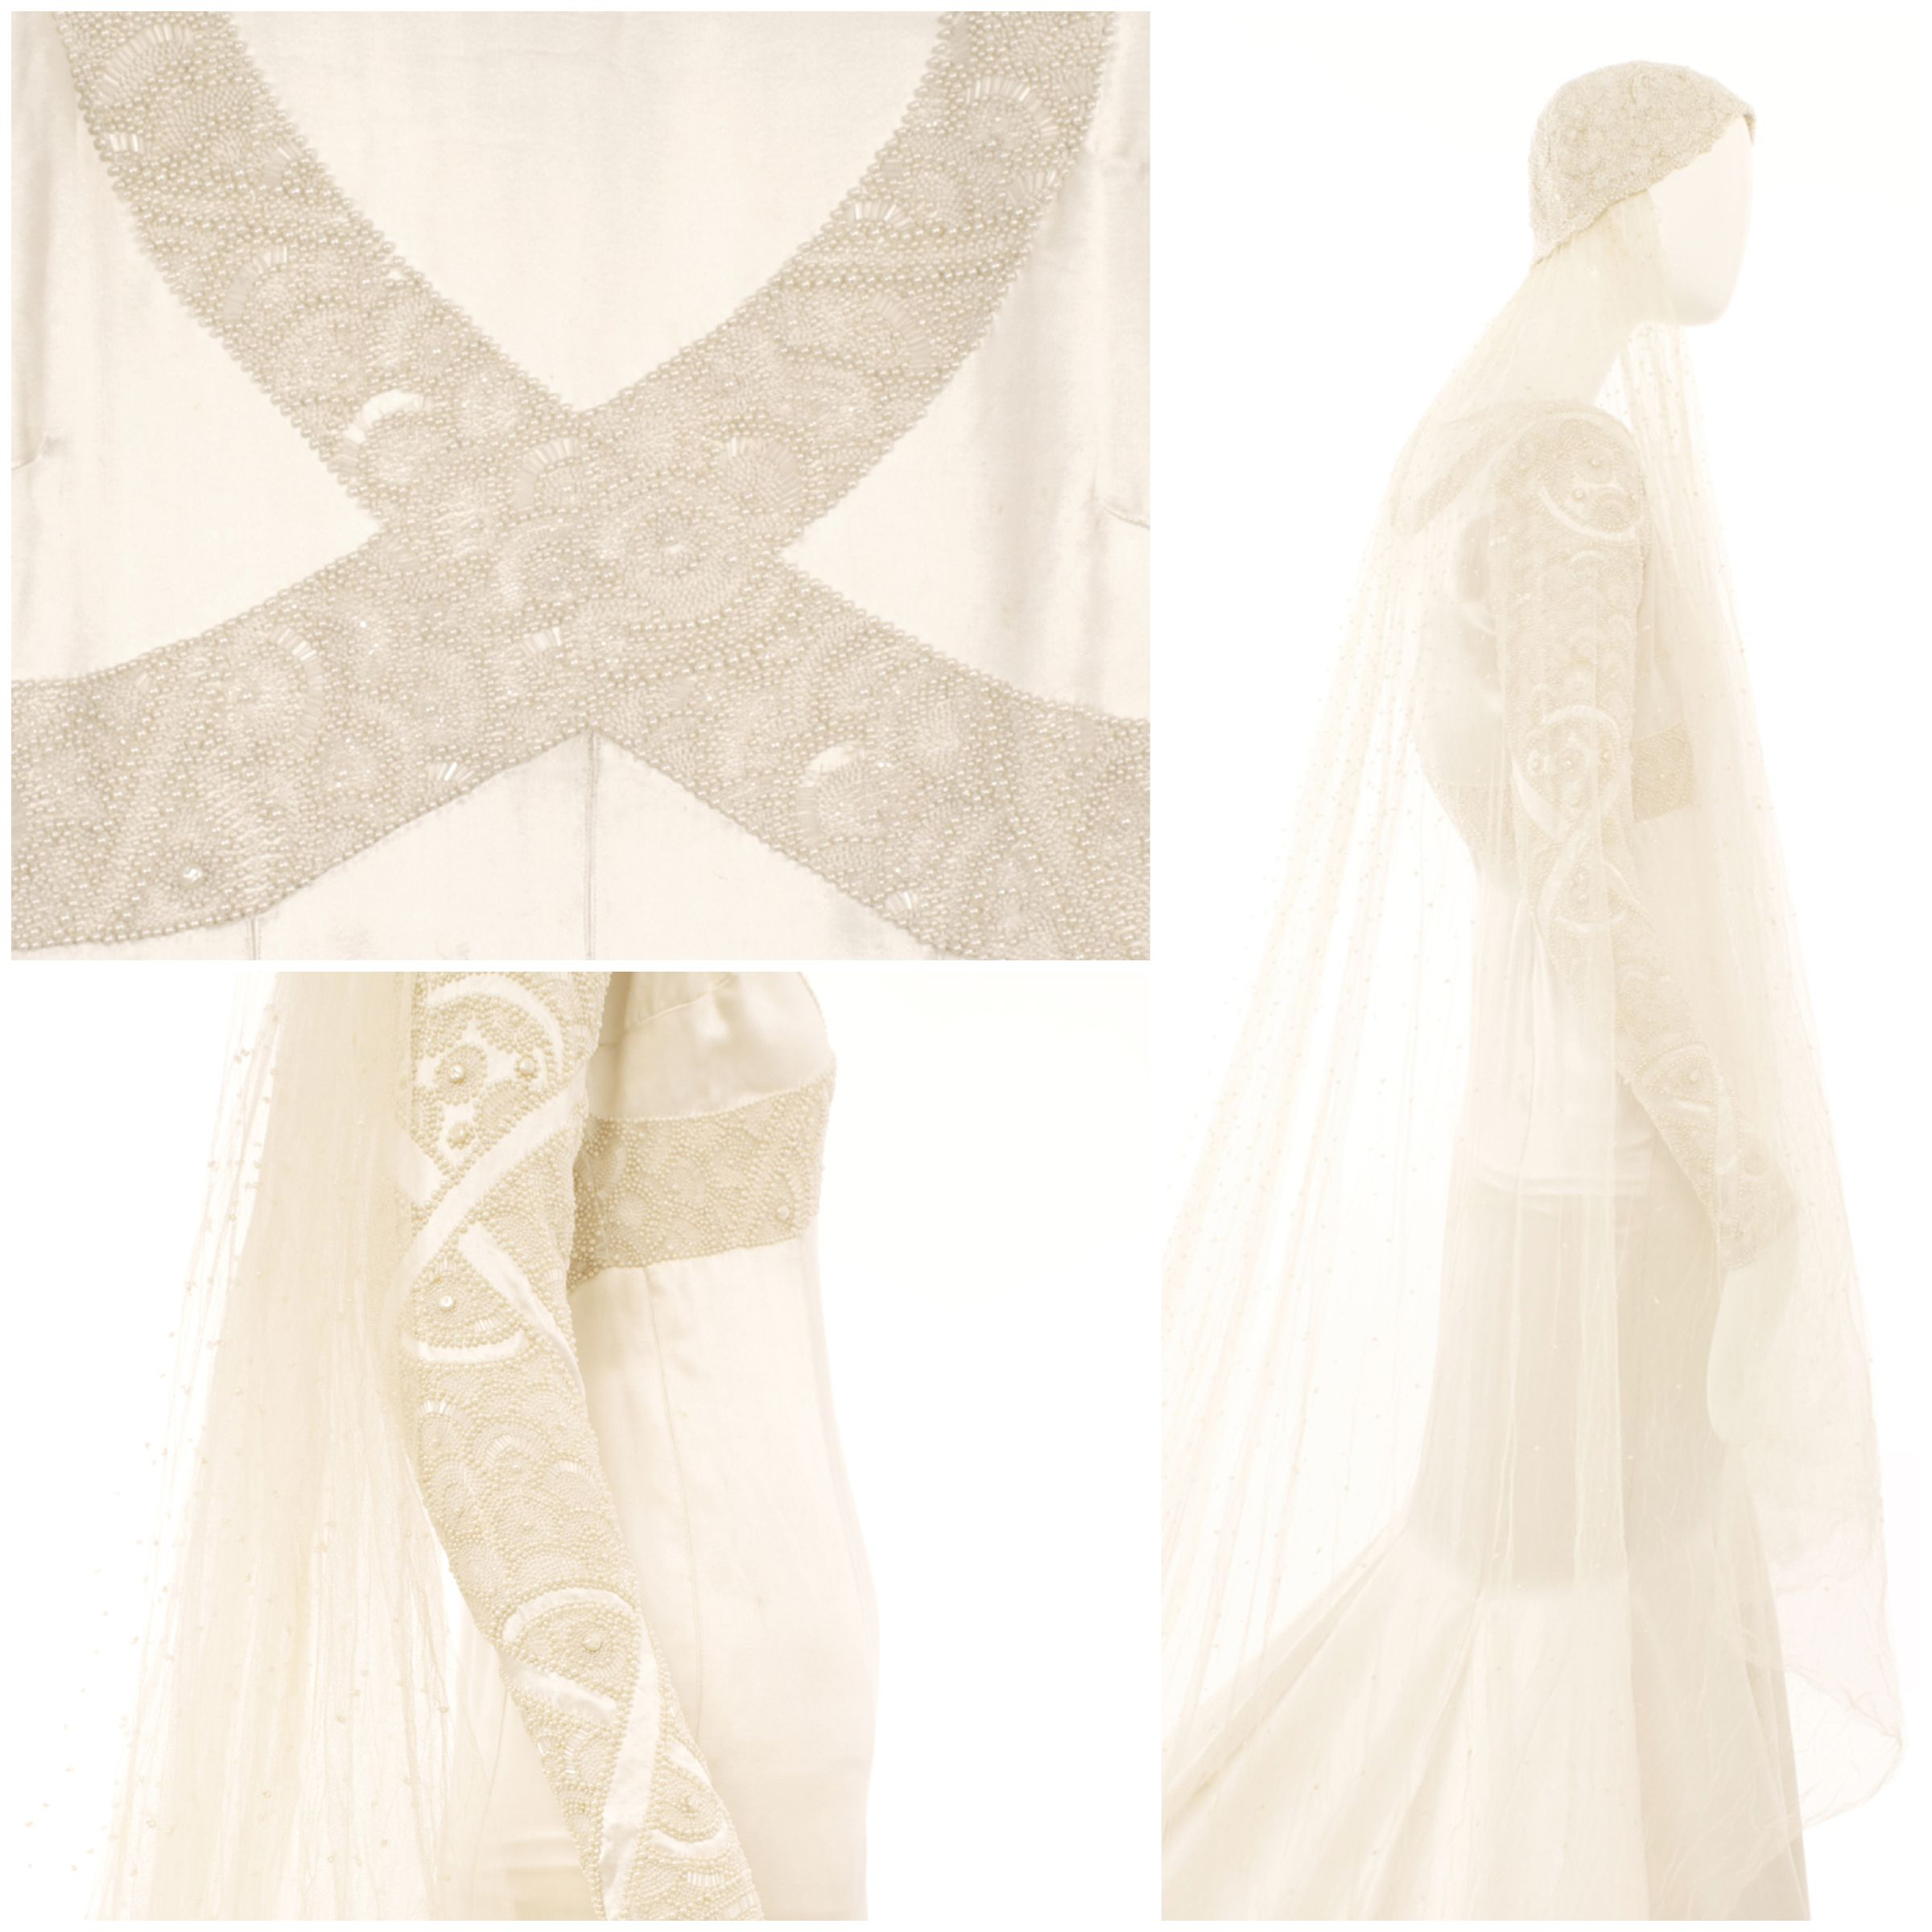 Vintage wedding dress under 500  Closeup details of a Norman Hartnell haute couture wedding dress